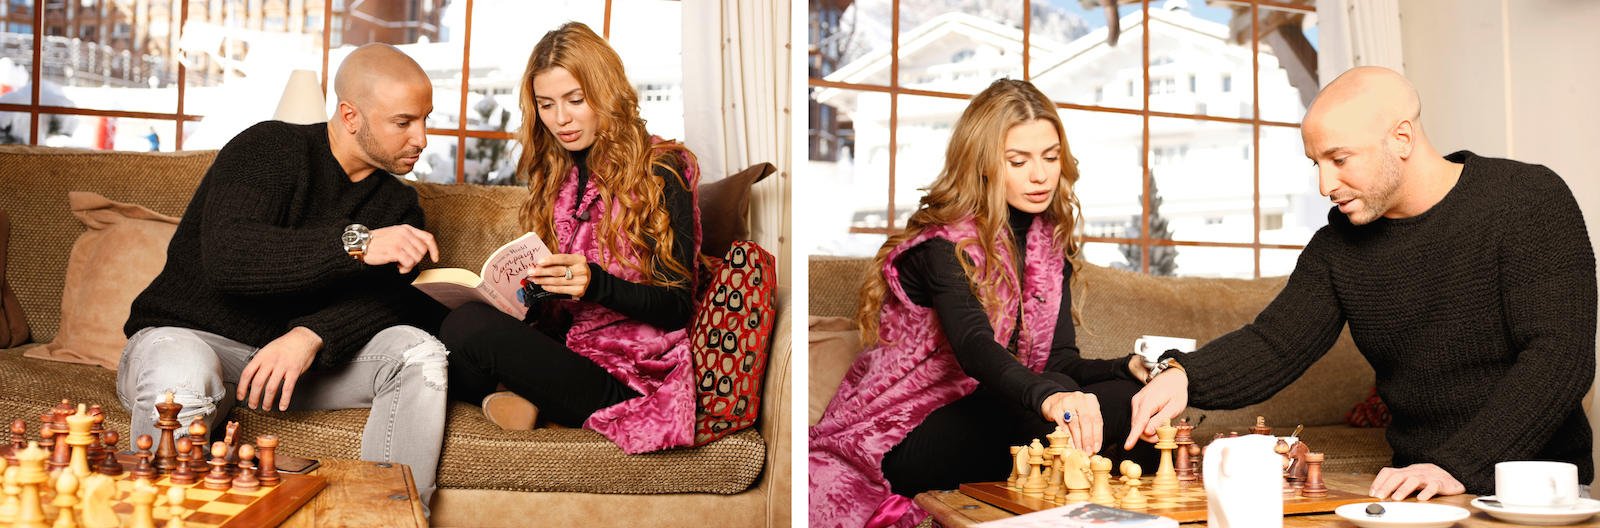 olivier chiappone photographe de mode publicit catalogue ditorial maillot lingerie pret. Black Bedroom Furniture Sets. Home Design Ideas